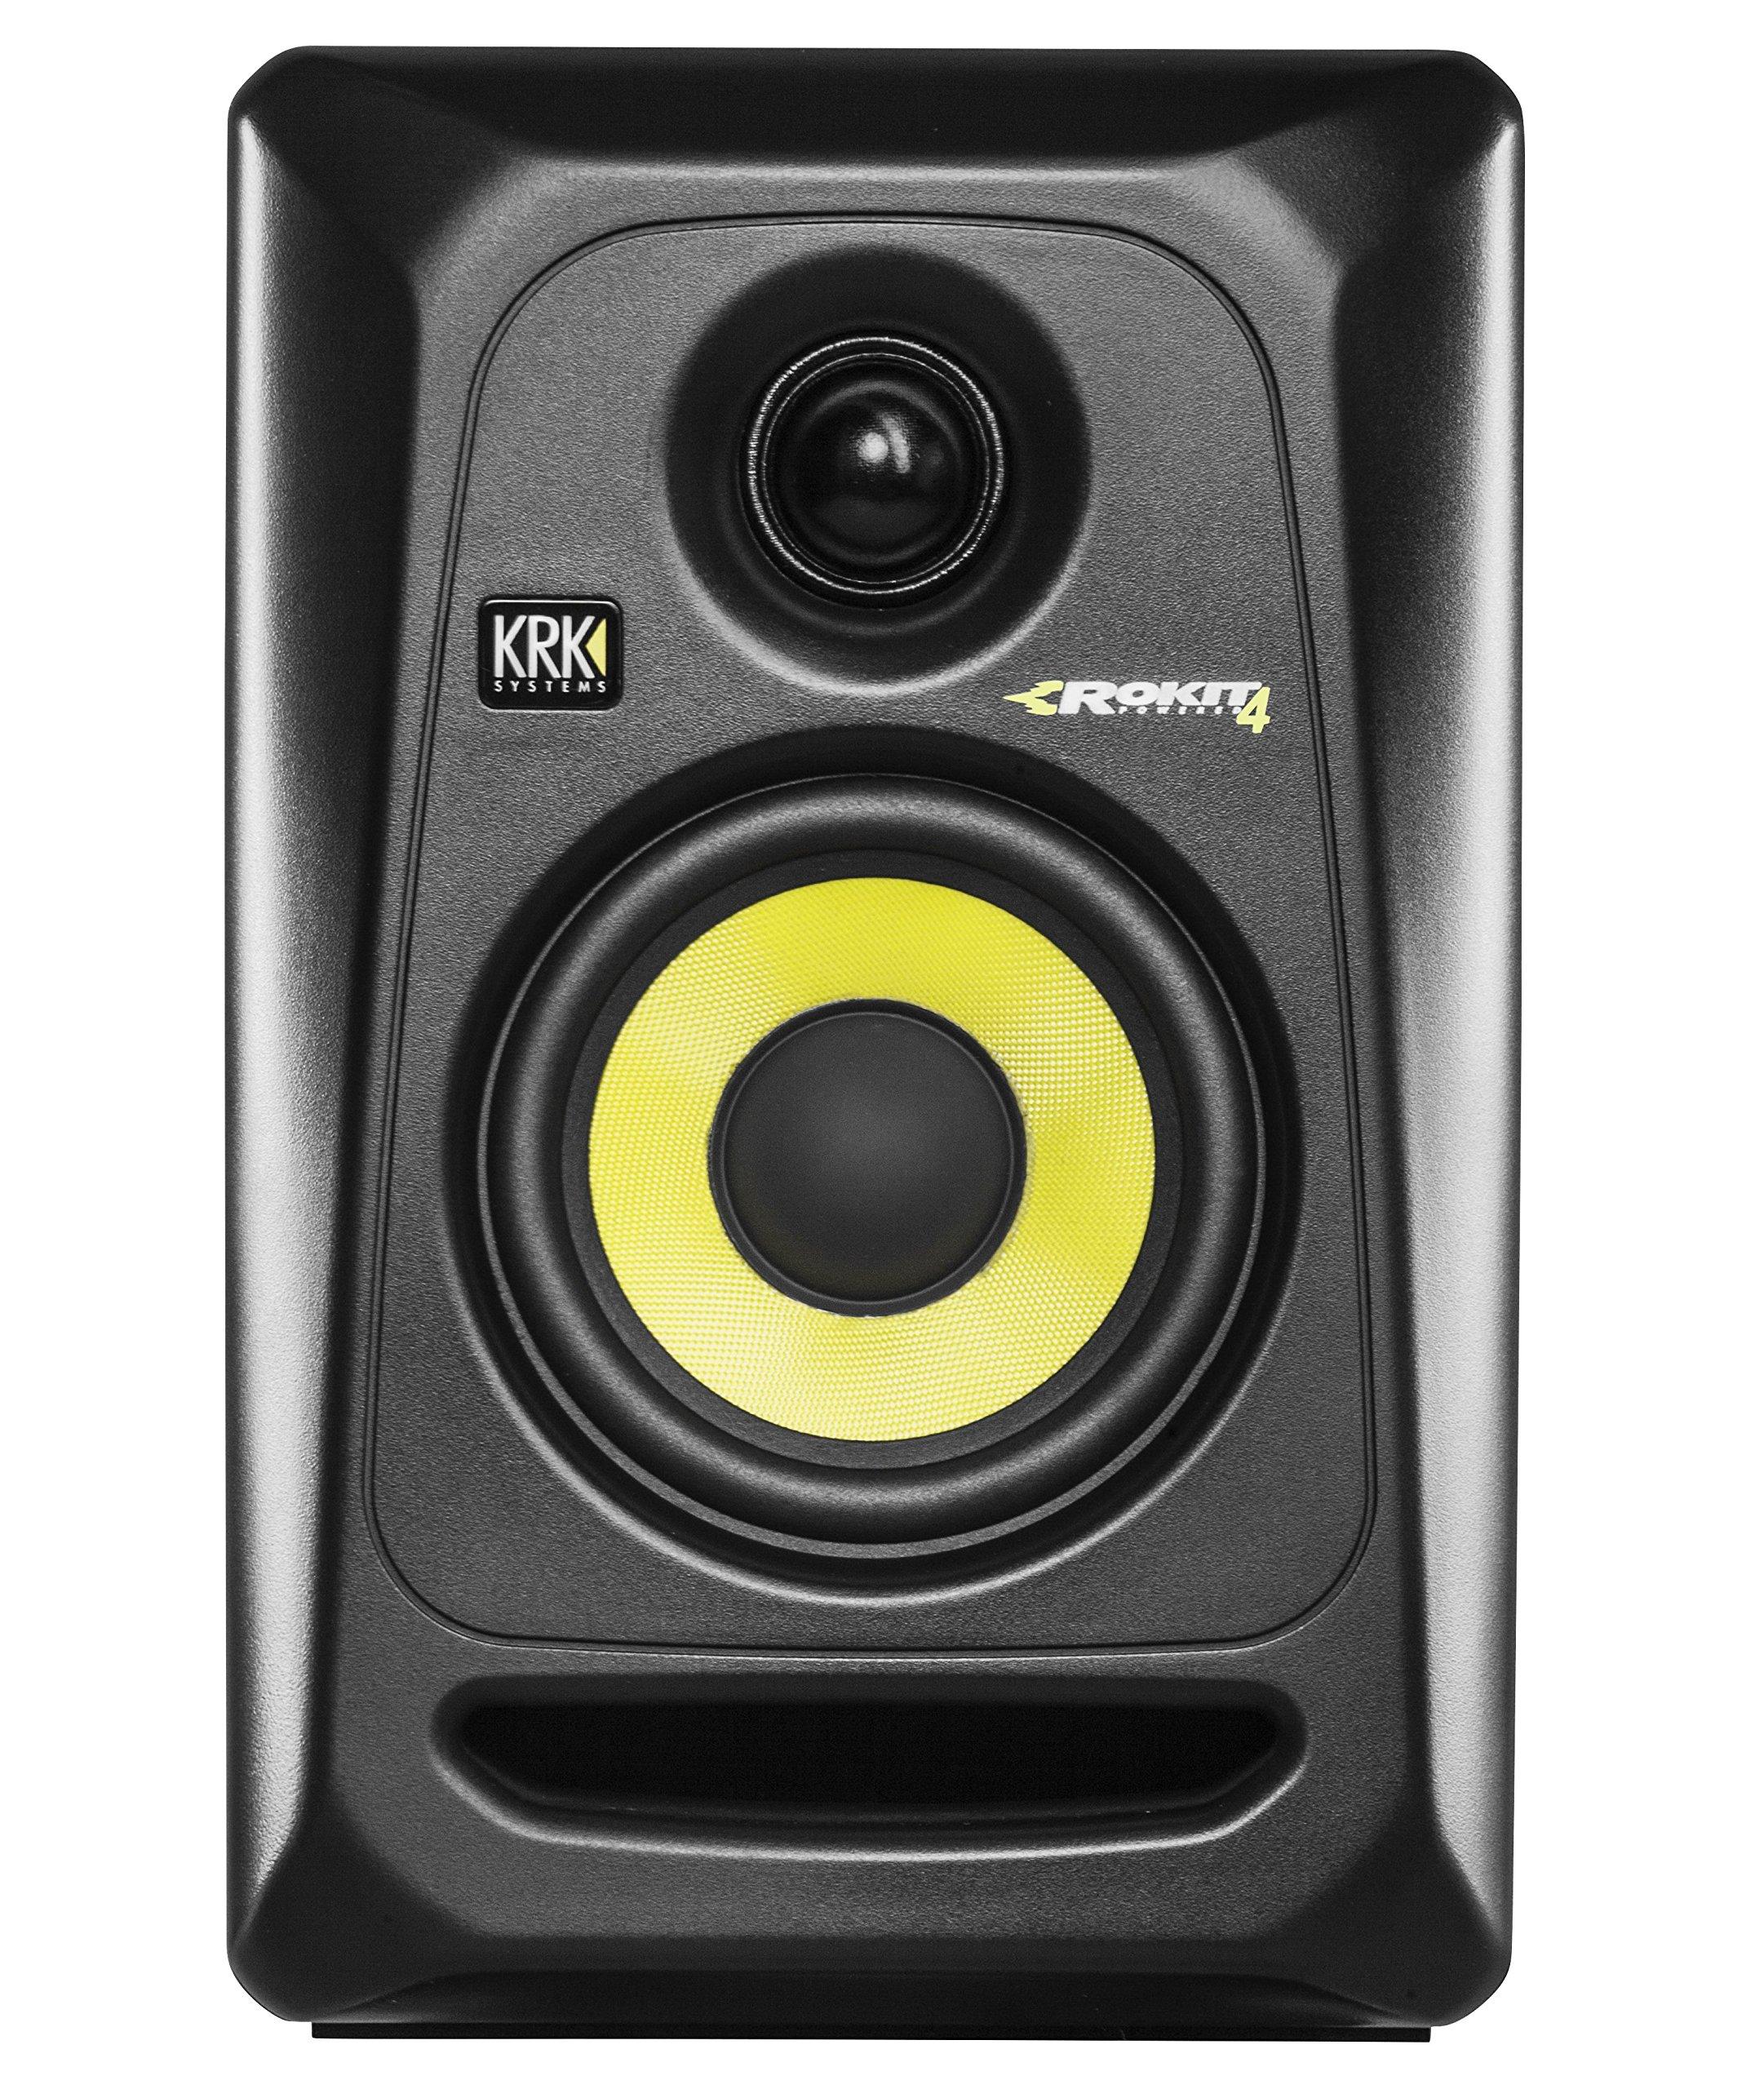 KRK RP4G3 ROKIT 4 G3 4'' 2-Way Powered Studio Monitor, Black